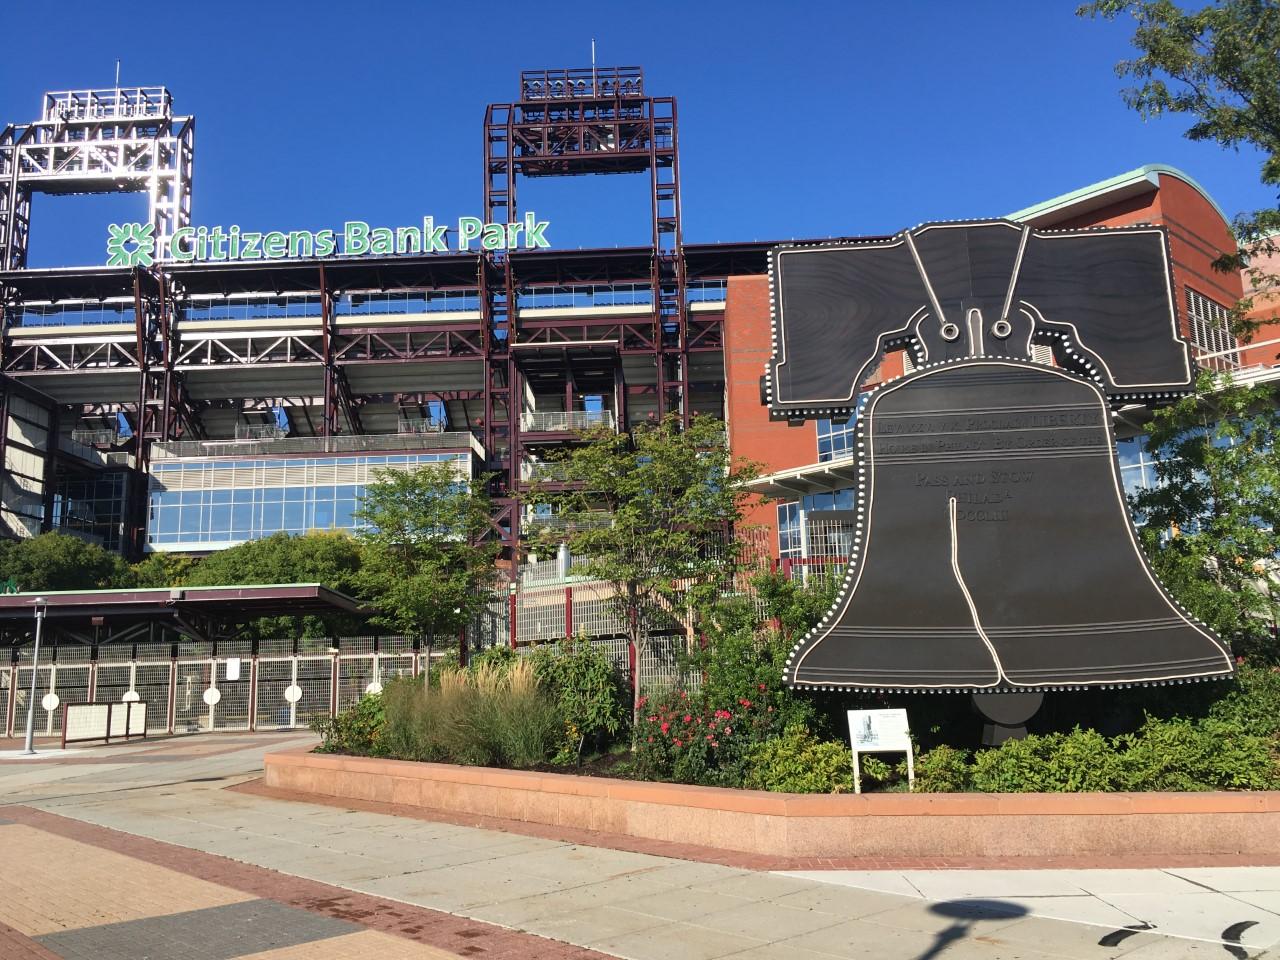 Jim Jackson won't return to Phillies radio broadcasts in 2021